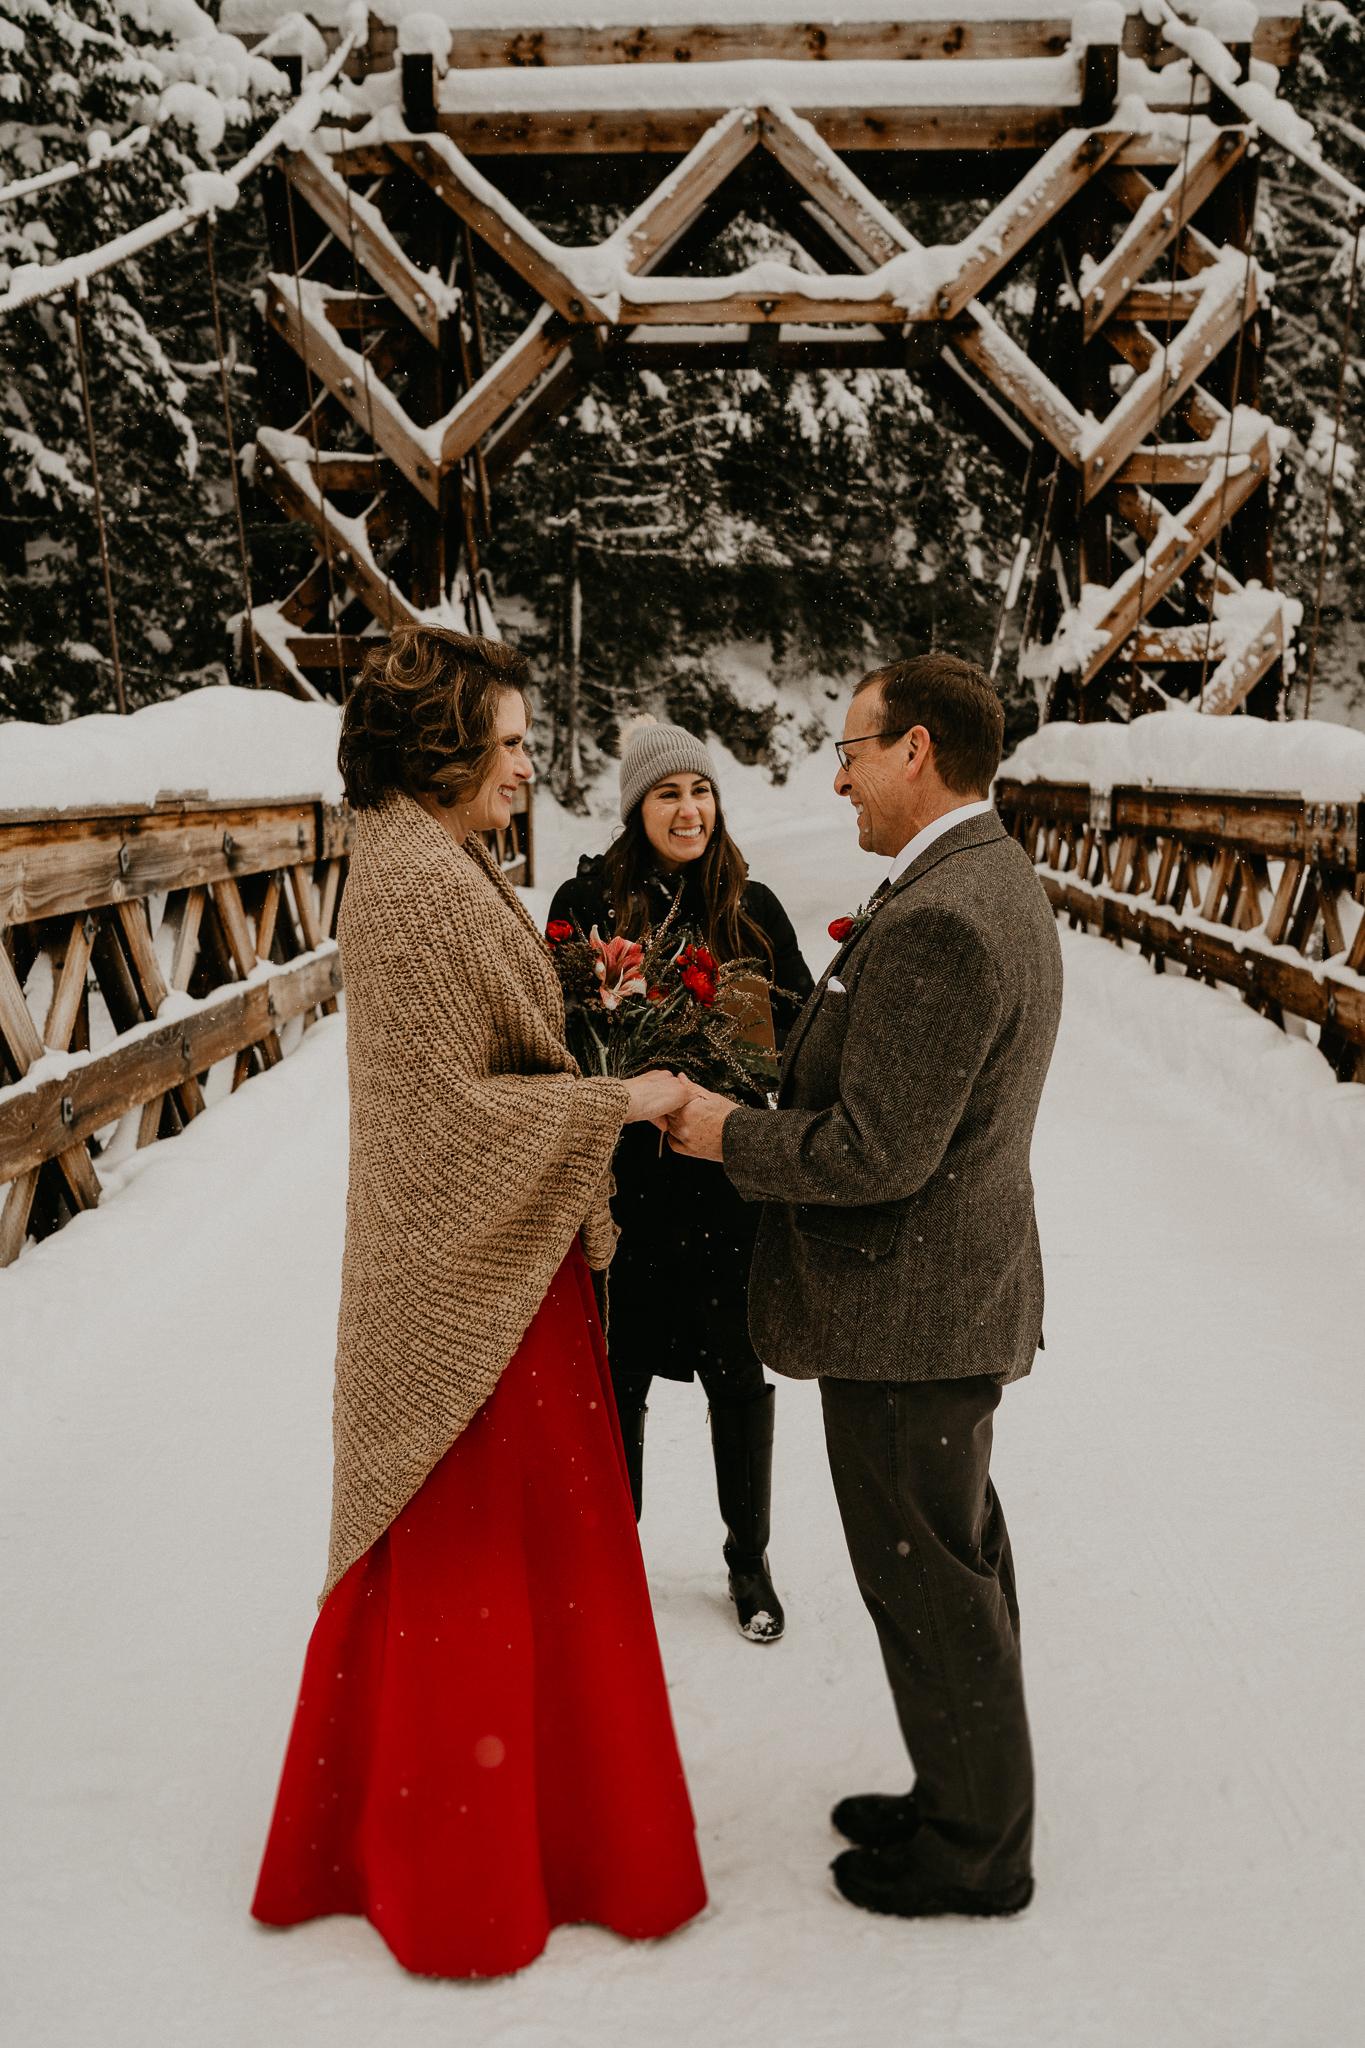 Mount-Rainier-Snow-Winter-Elopement-Adventure-Photographer2-36.jpg